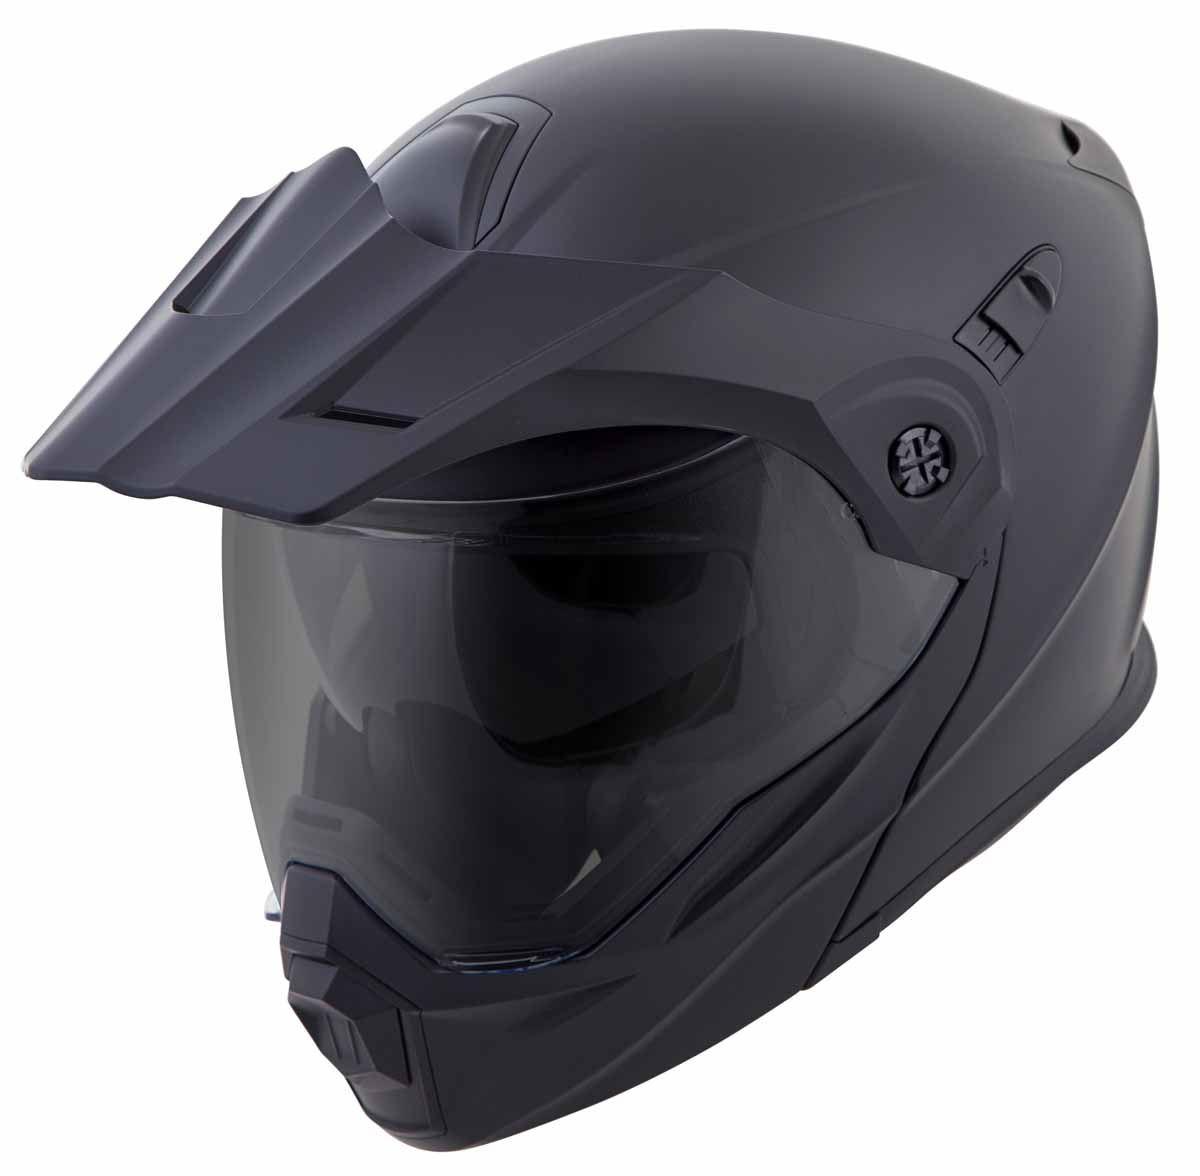 Scorpion-EXO-AT950-Helmet-Flip-Up-Modular-Dual-Sport-Adventure-ADV-DOT-XS-3XL miniature 26